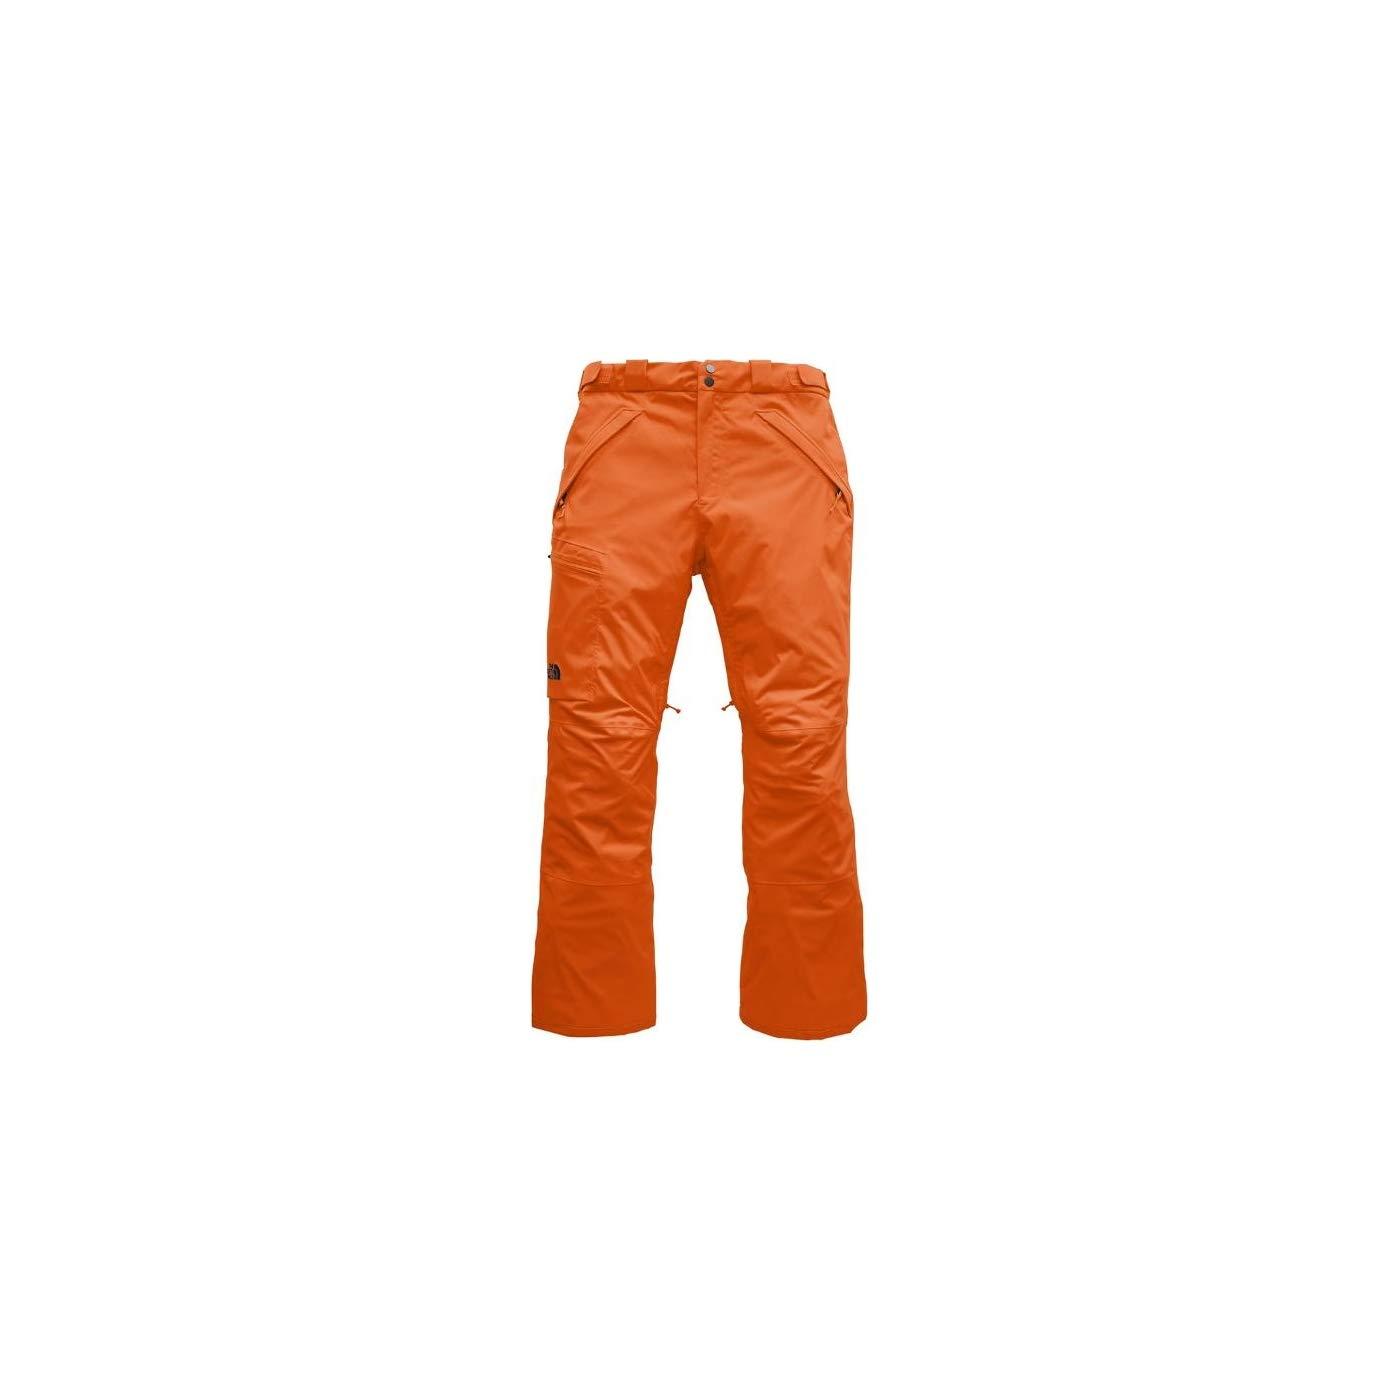 17da3ec1db The North Face Pantalon De Ski M Sickline Pant Orange